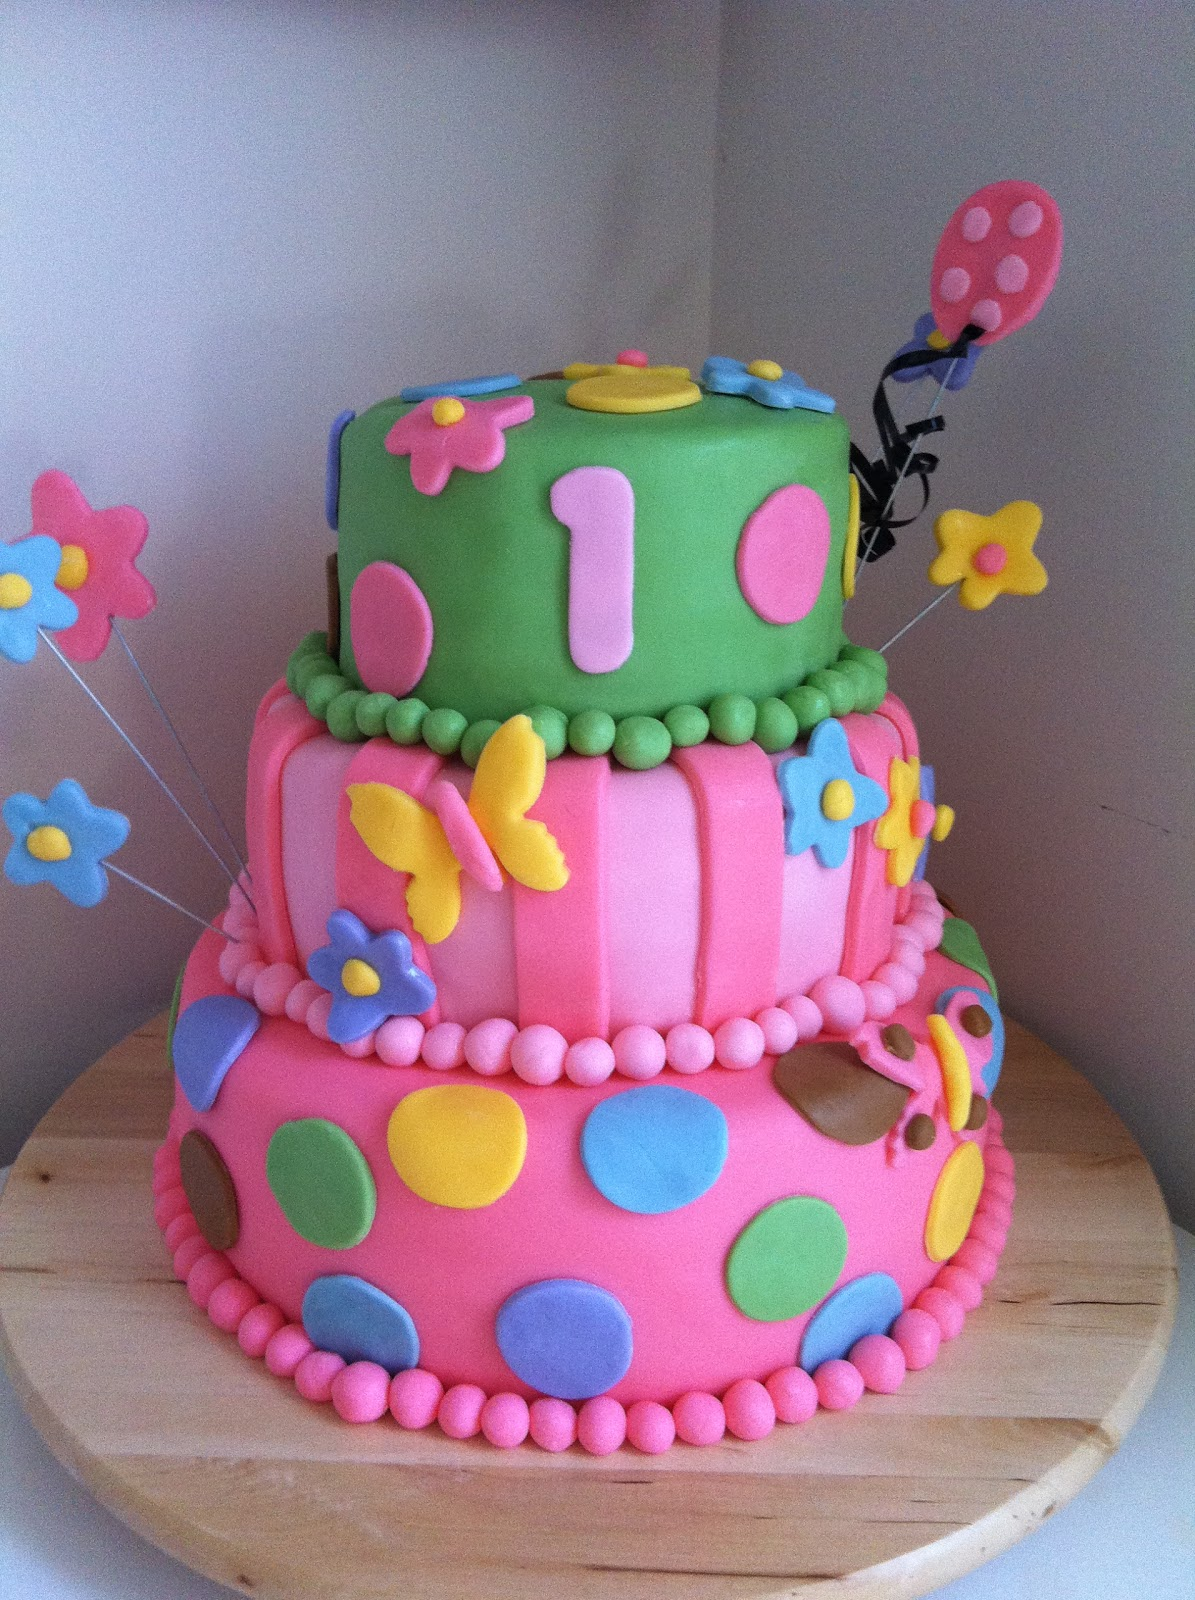 Girly Birthday Cake Designs